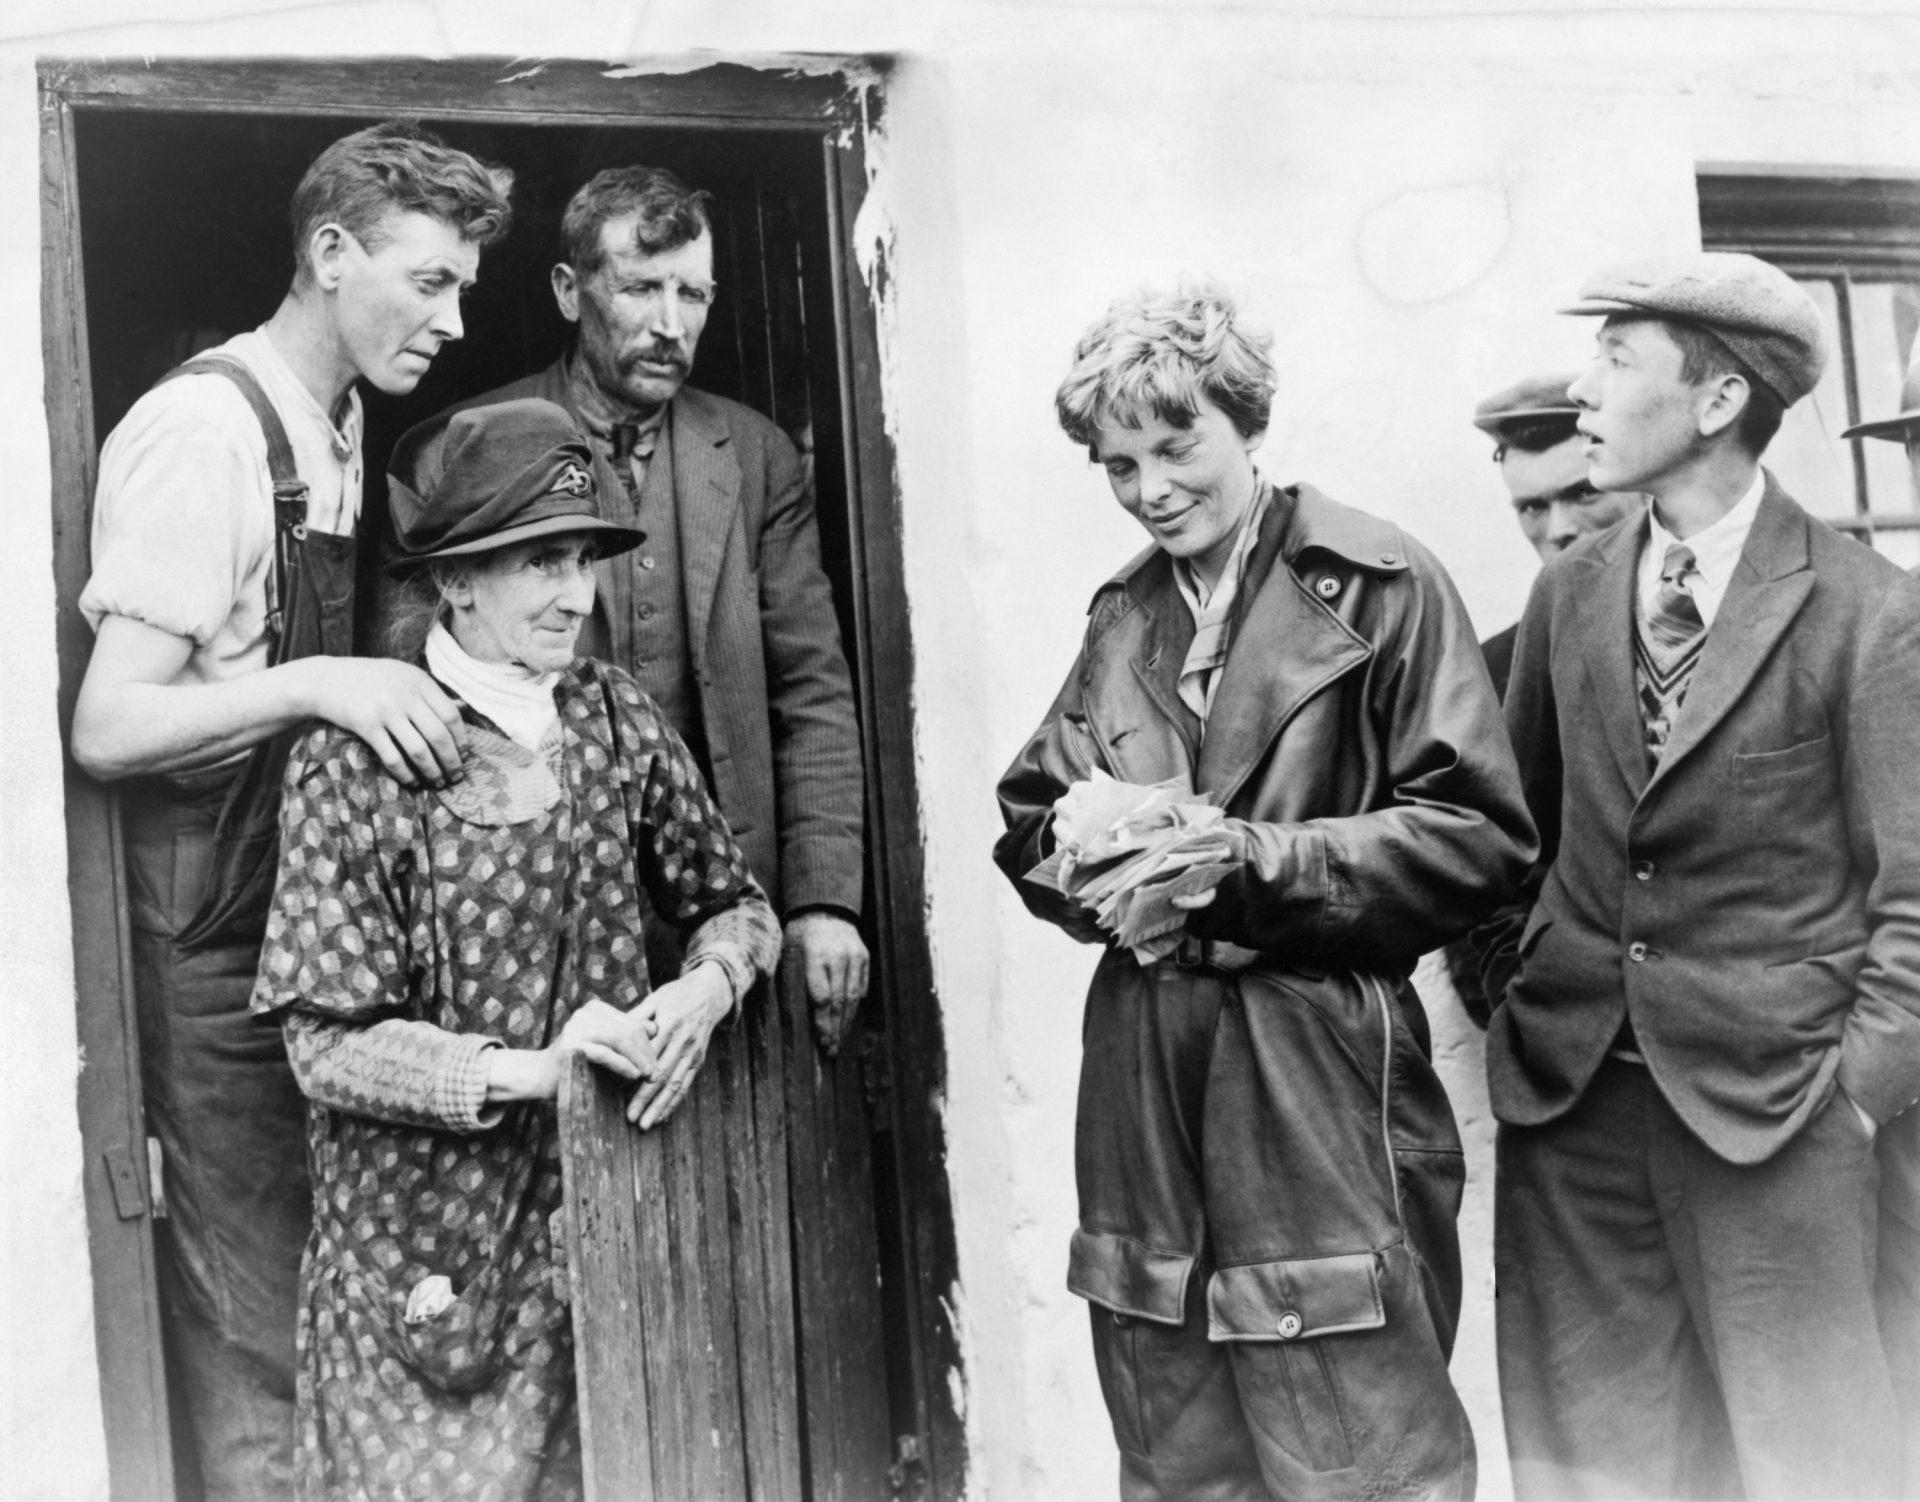 Amelia Earhart meets the good folk of Culmore, Derry after landing her first transatlantic flight – Shutterstock